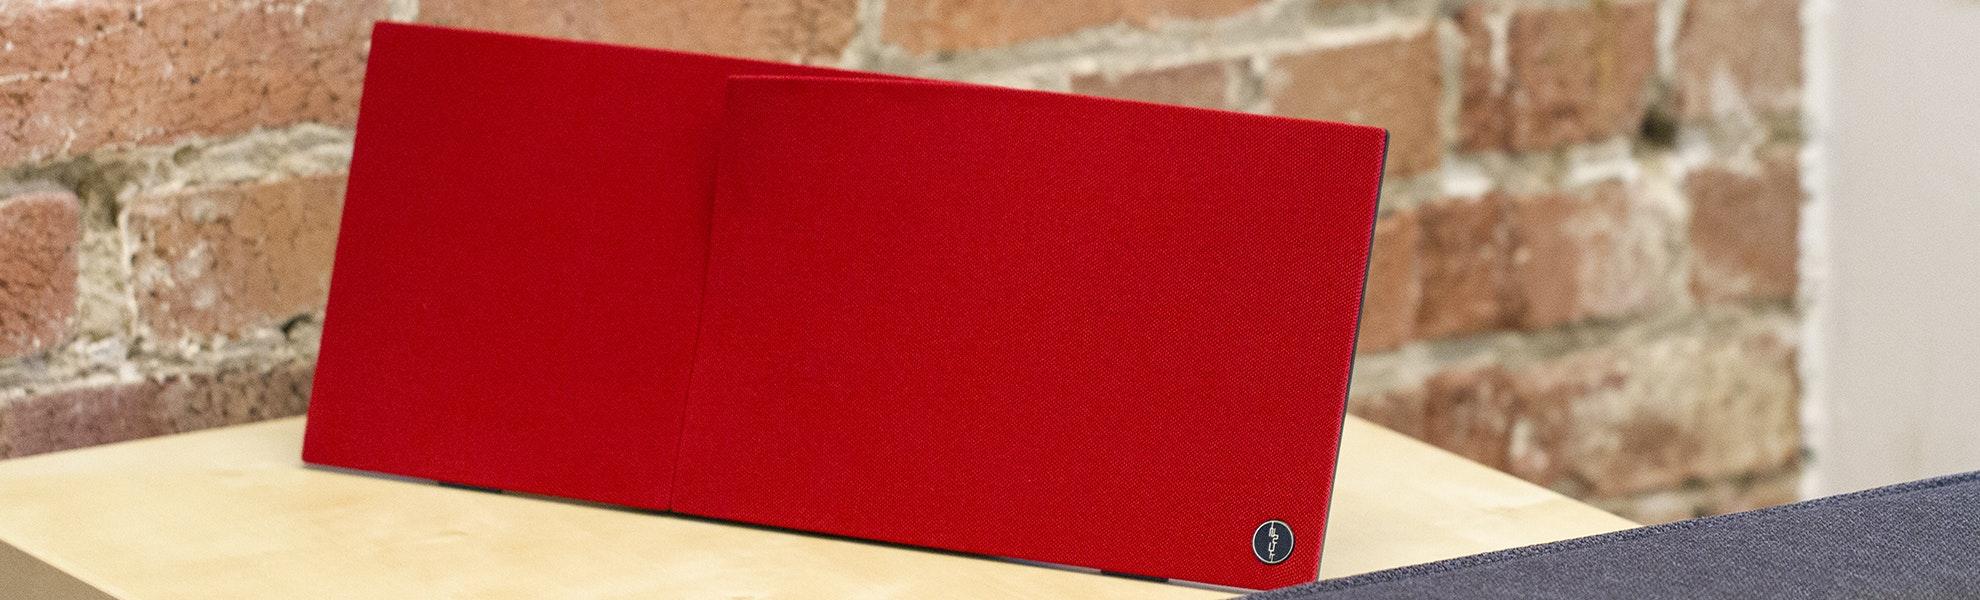 In2uit Filo Portable Electrostatic Speakers